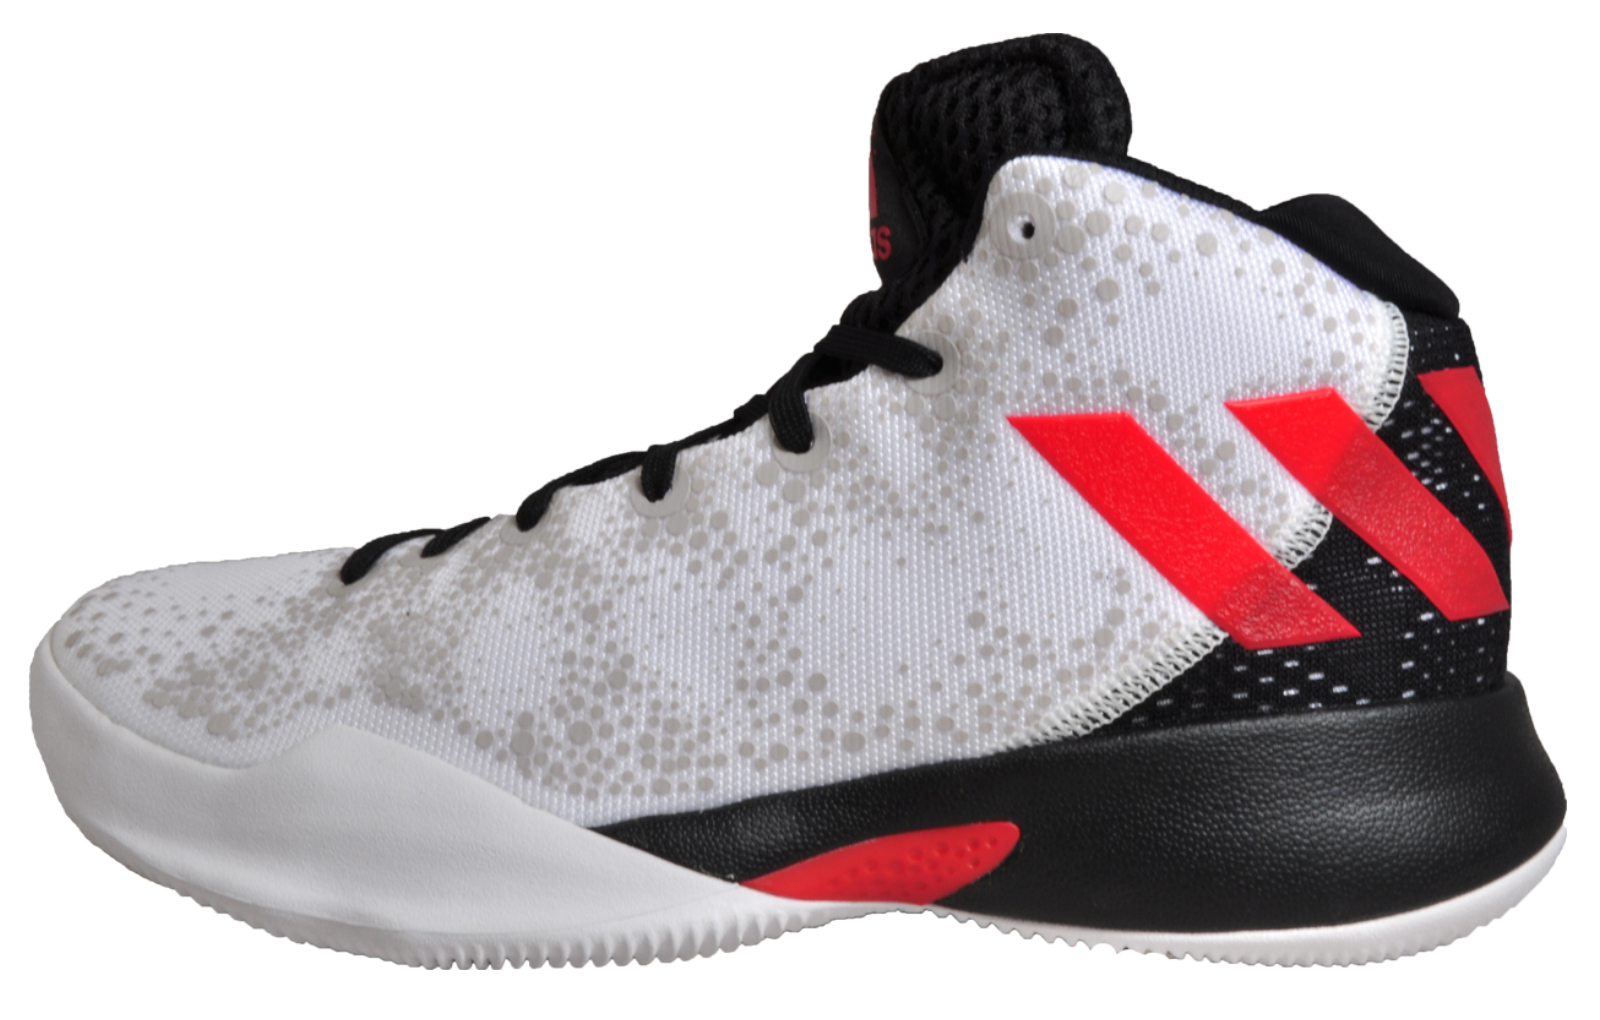 1902ac811d03 Adidas Crazy Heat Junior Boys Kids Hi-Top Basketball Trainers Sneakers